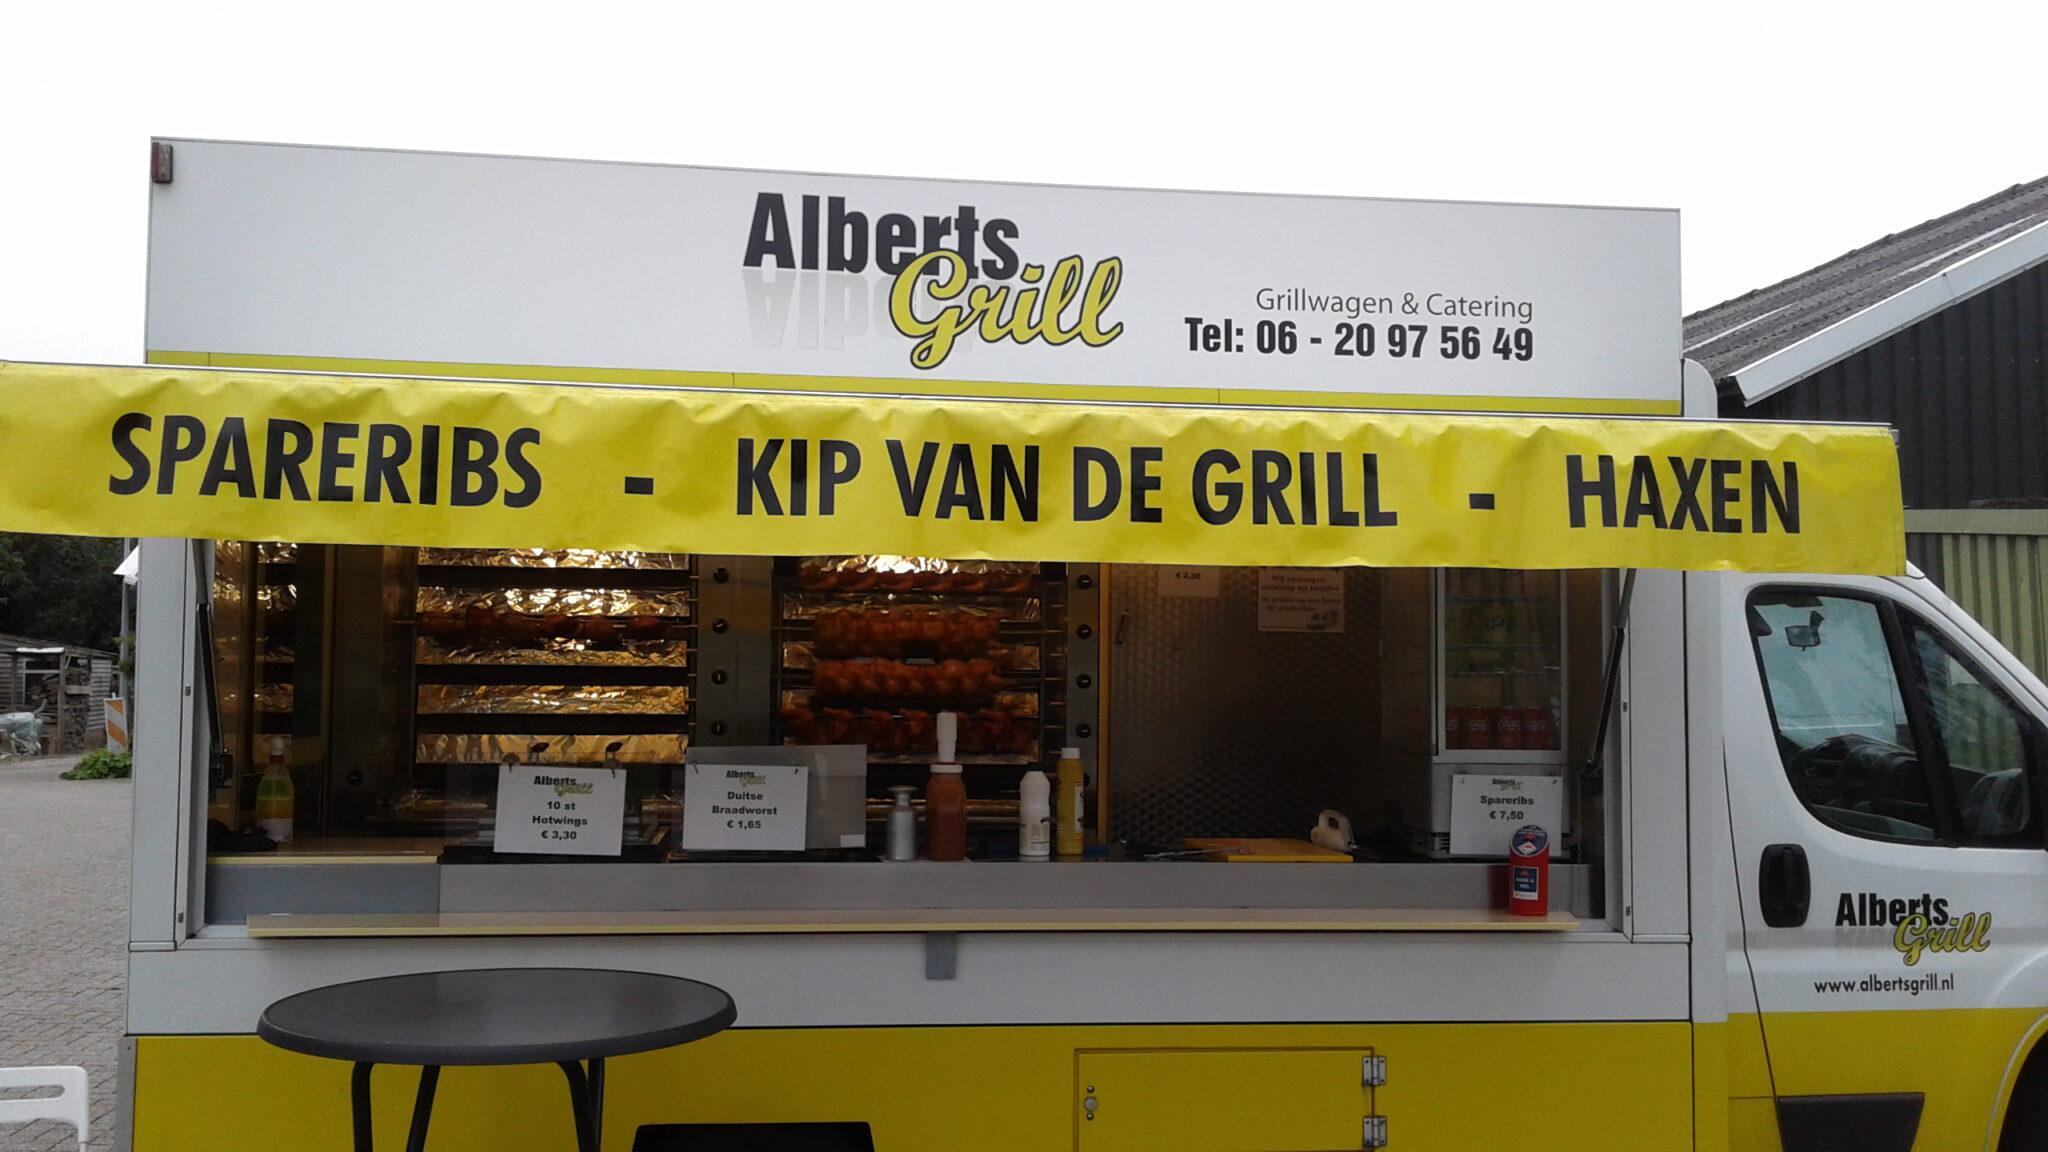 alberts grill